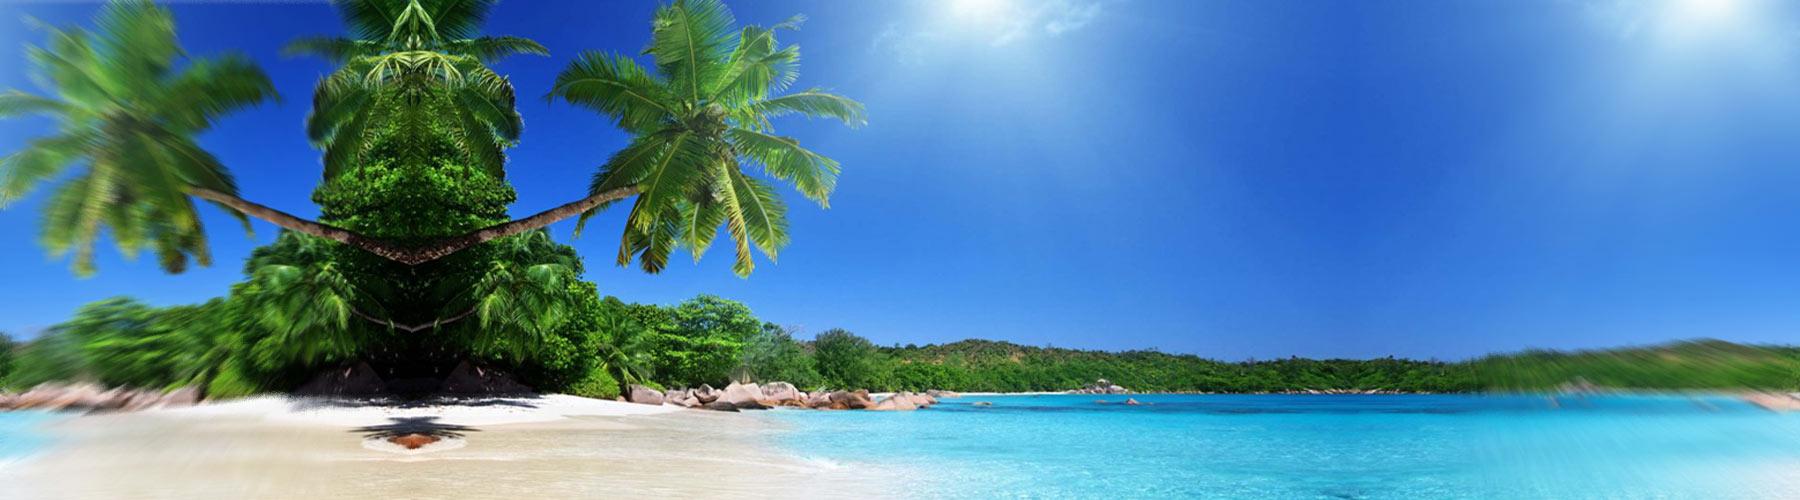 Plaje Exotice Zanzibar, Lamu